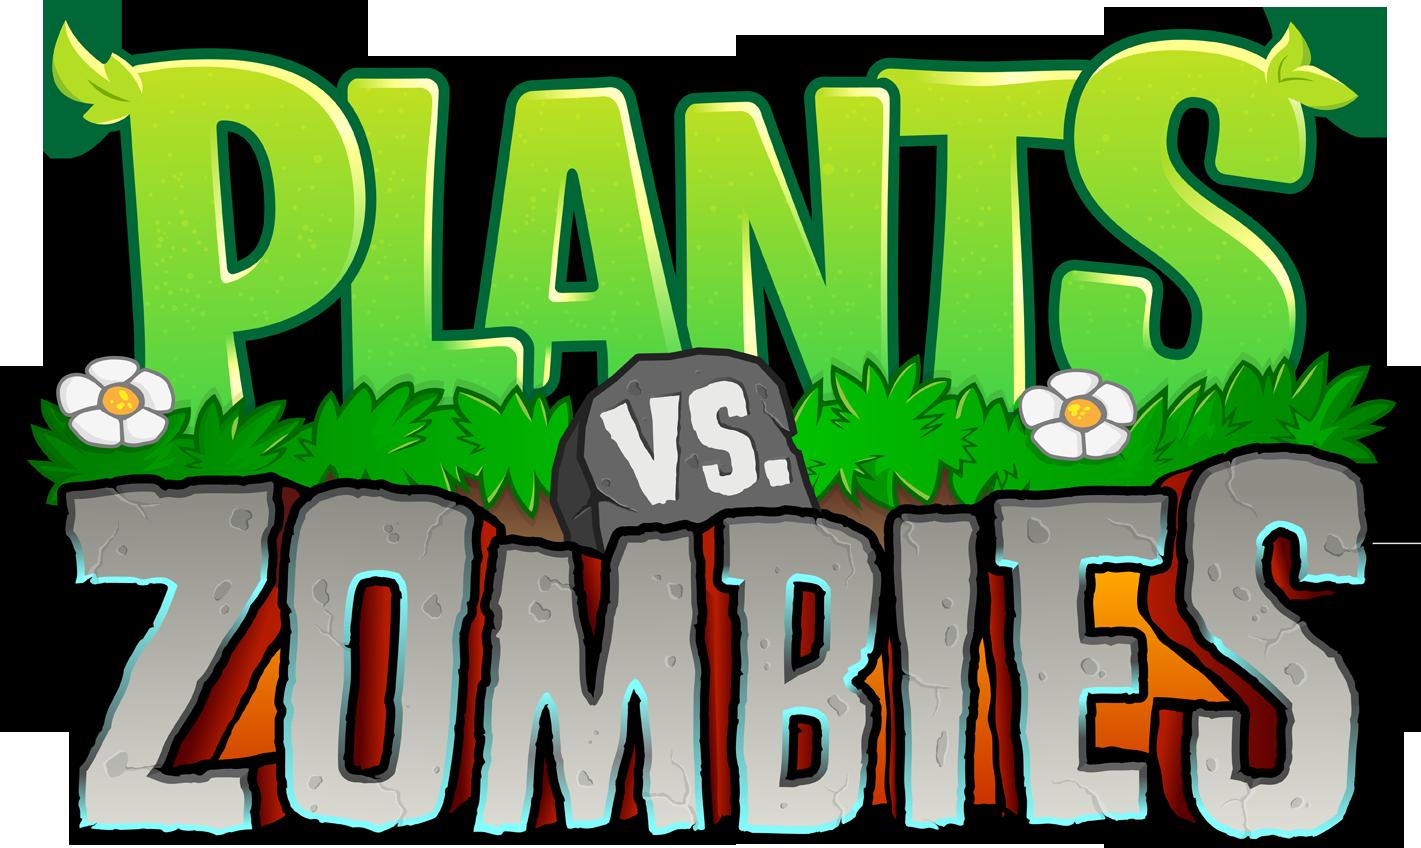 Plants Vs Zombies PNG - 7880